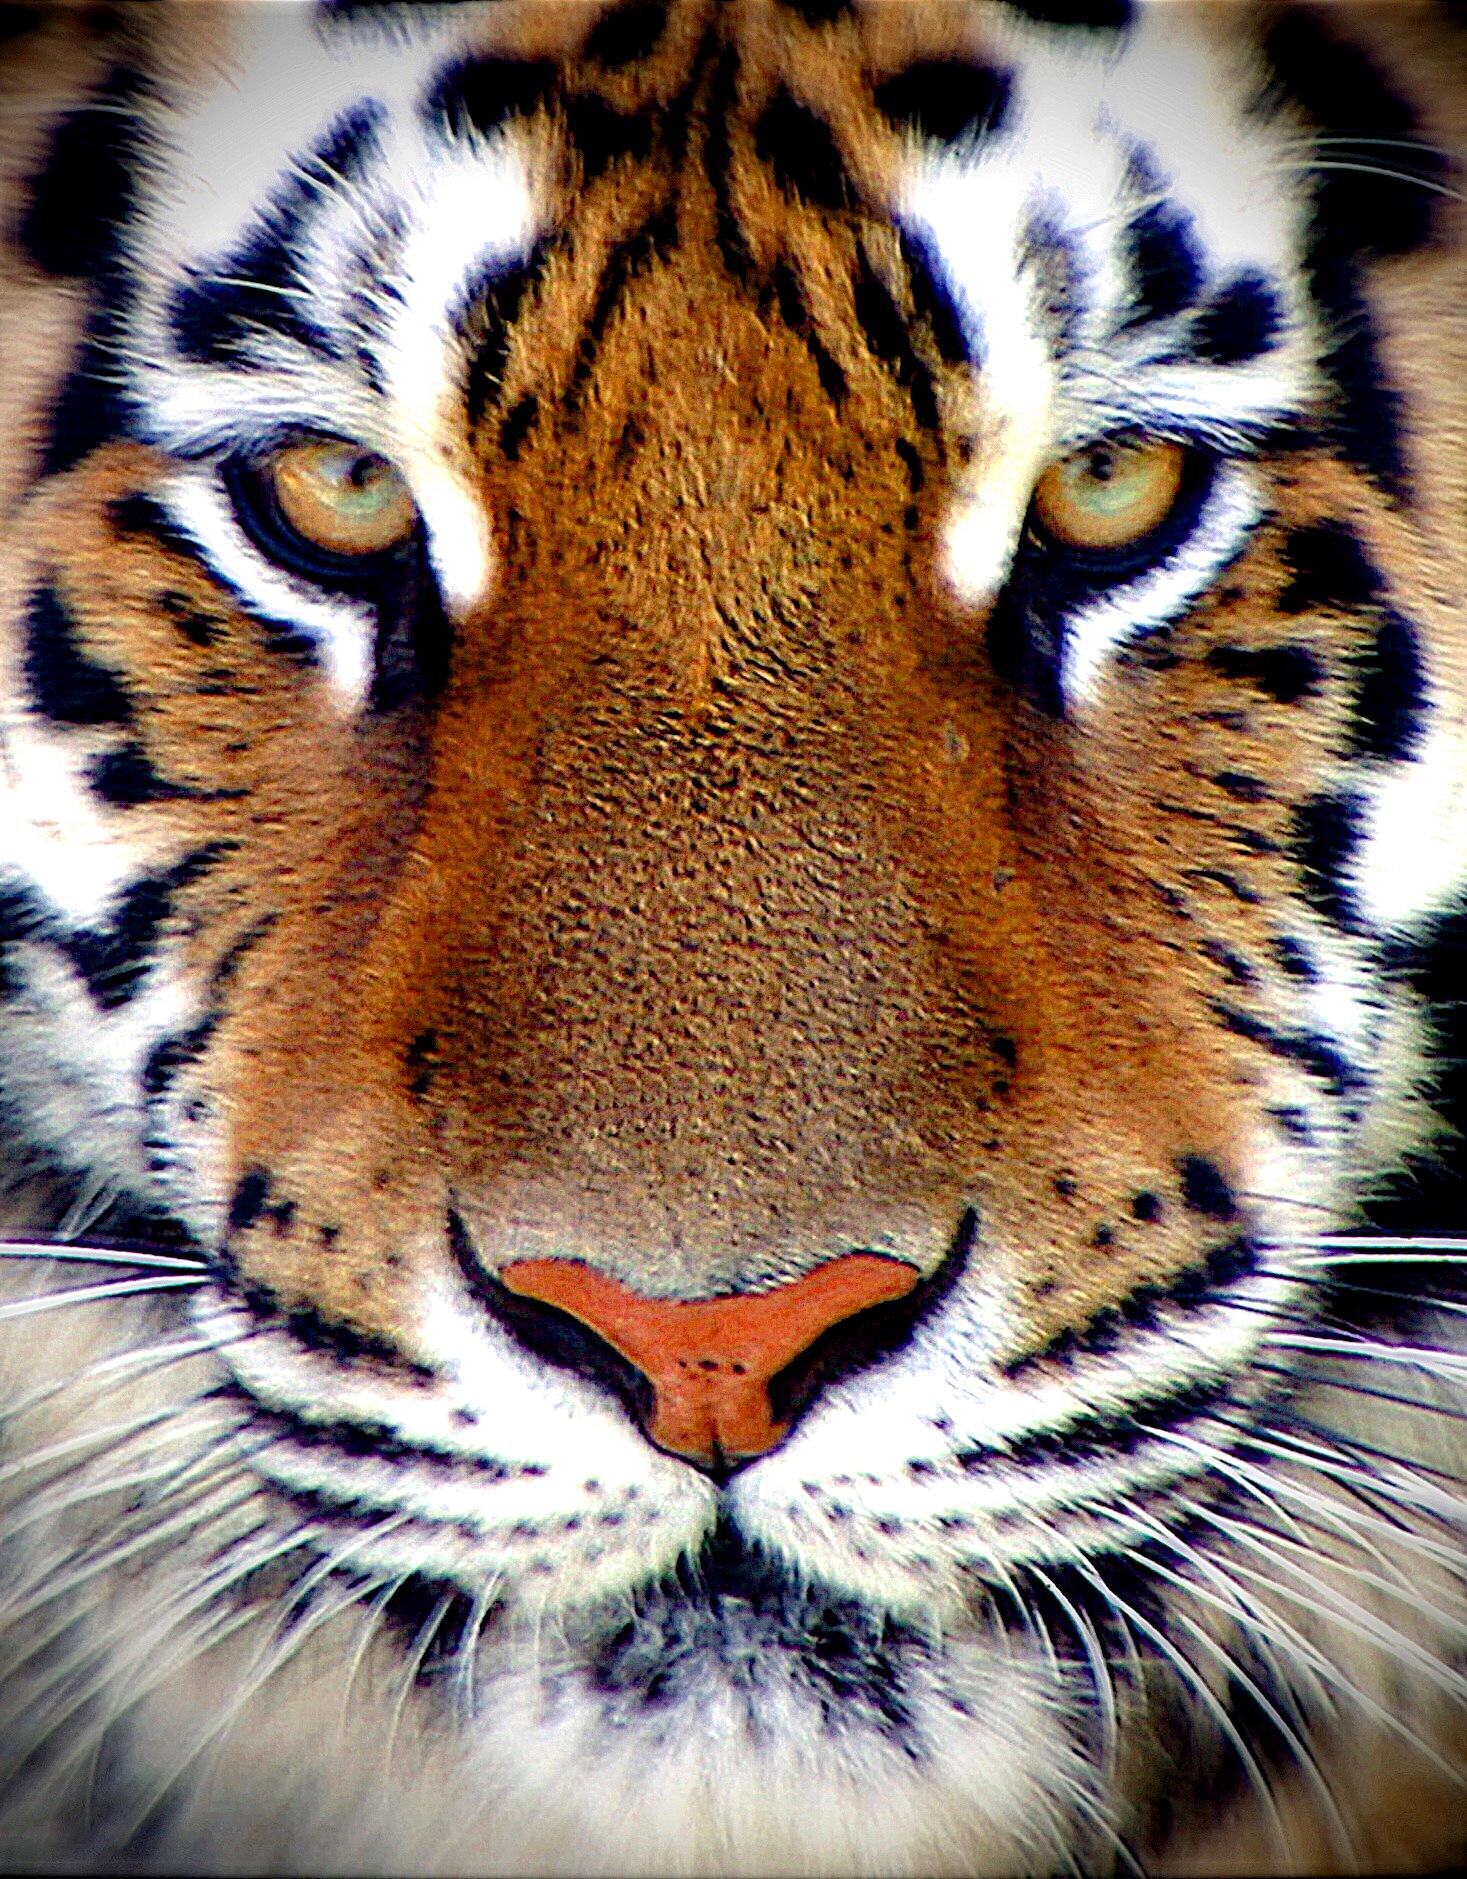 Tiger Face by Stuart Rosenthal